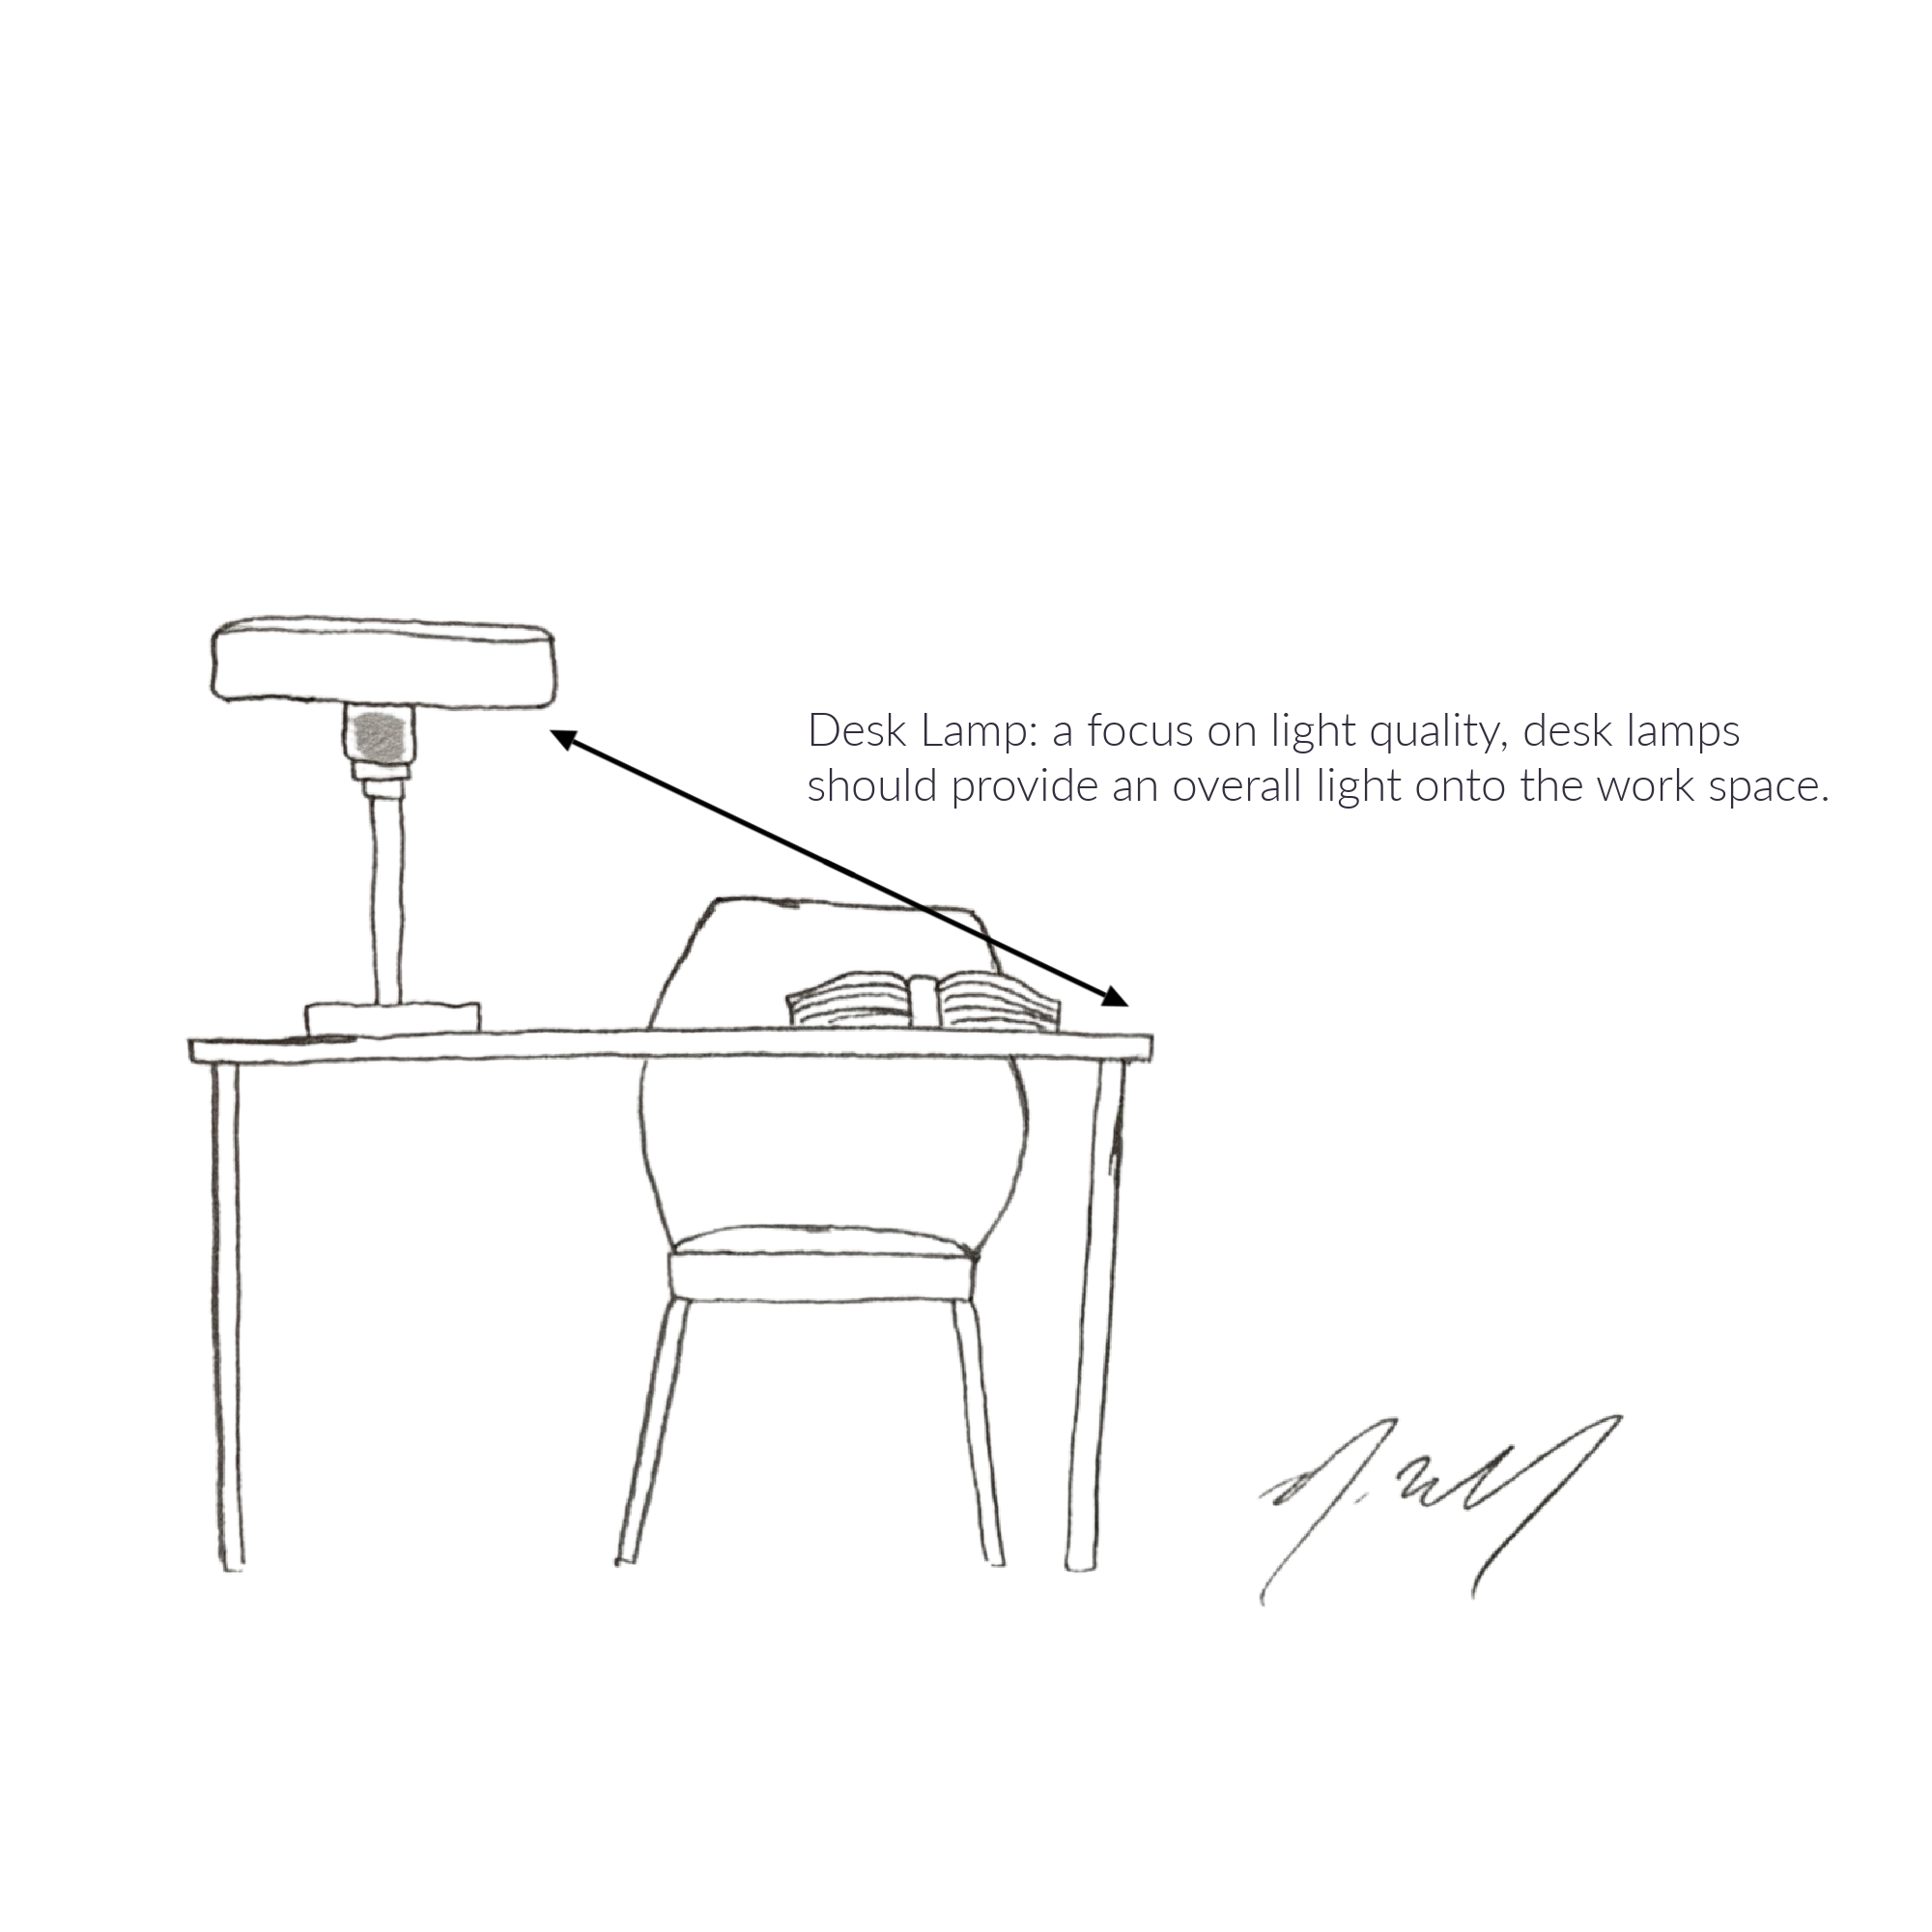 Desk Lamp Tip 1